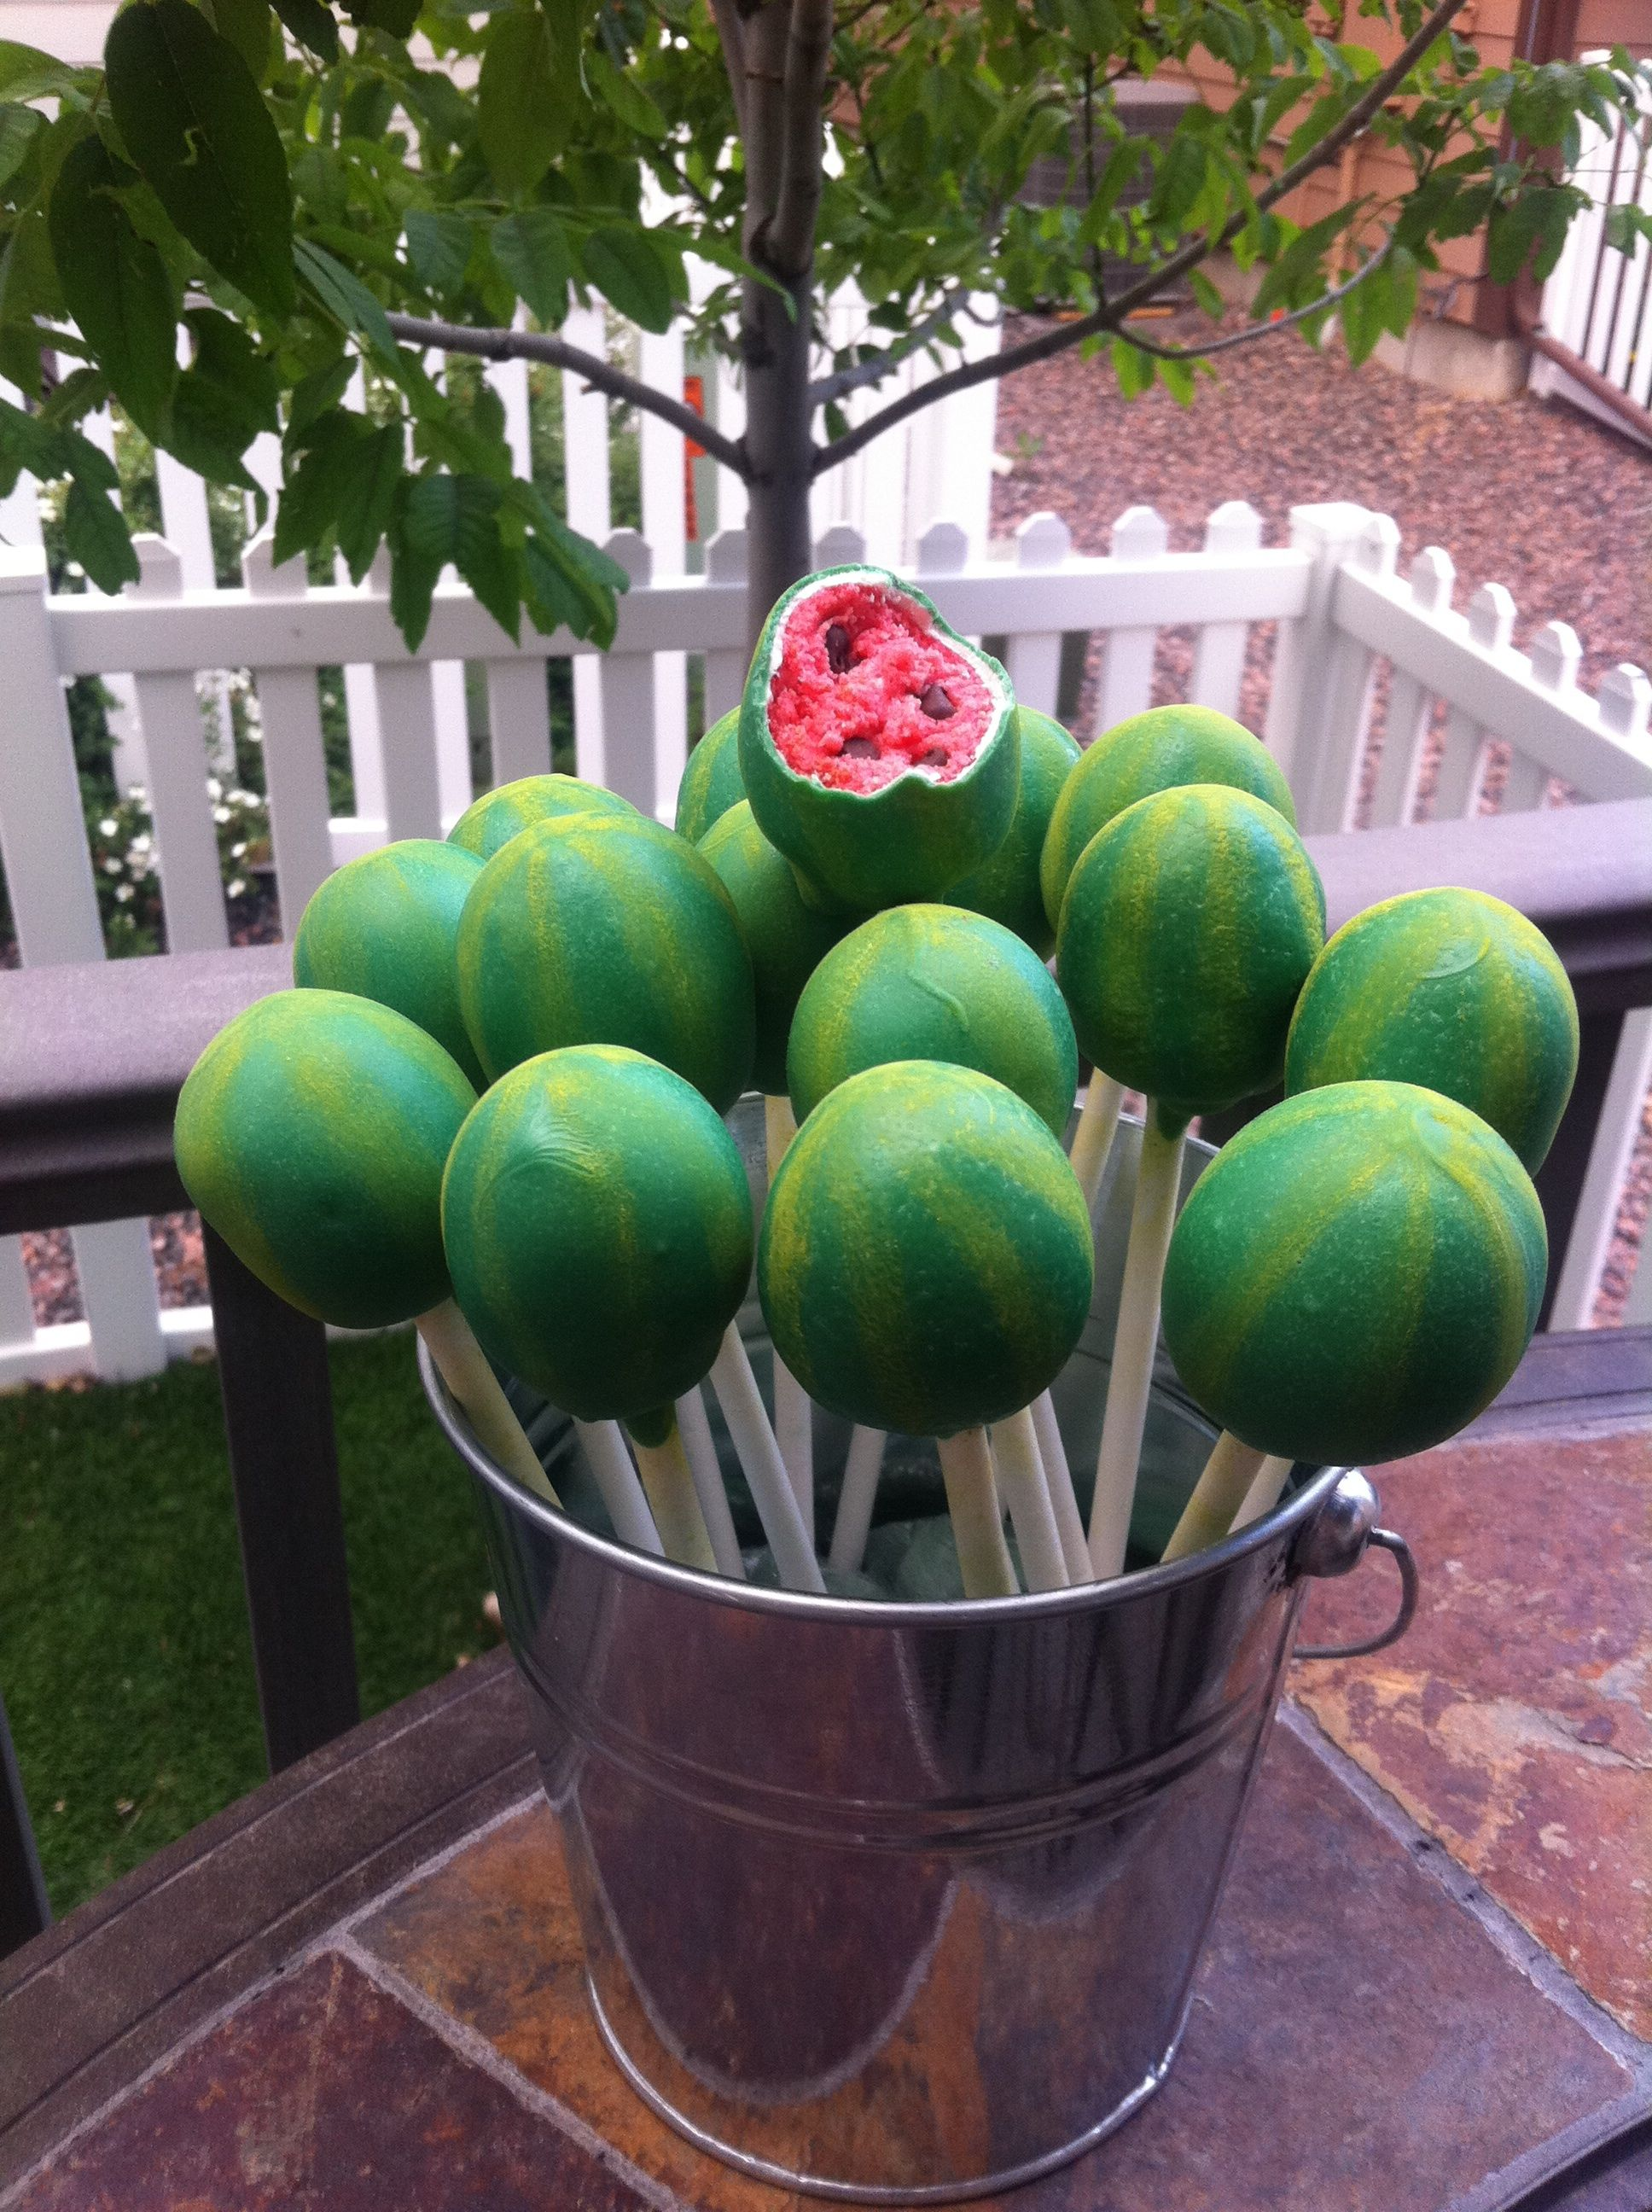 Watermelon lollicakes